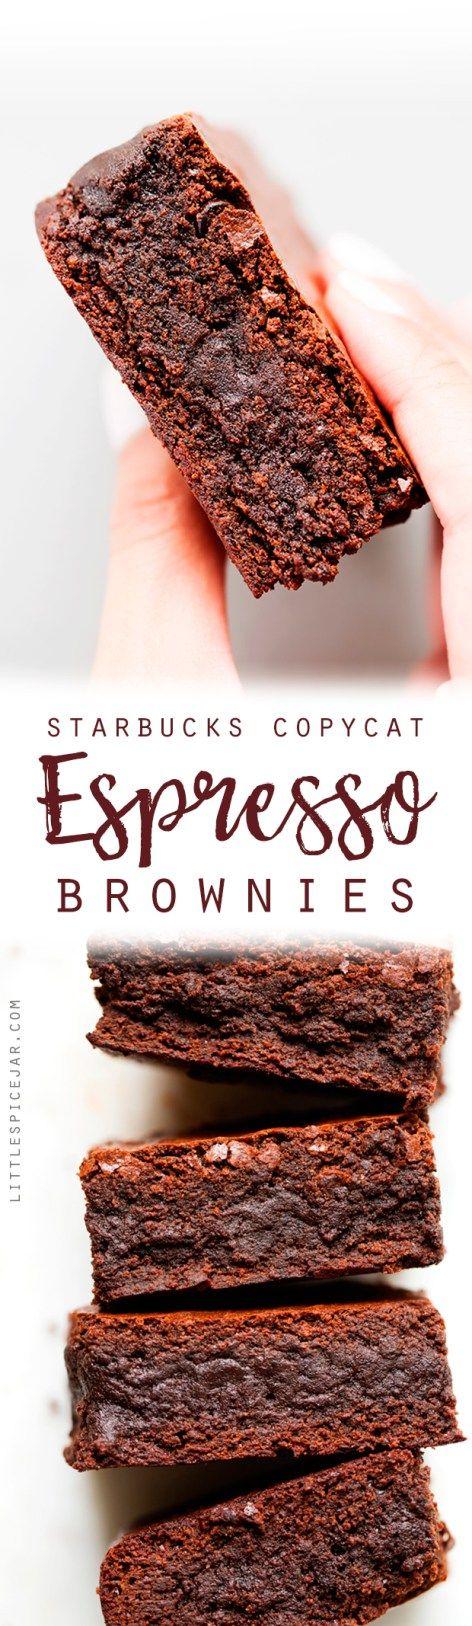 Stabucks Coffee Brownie